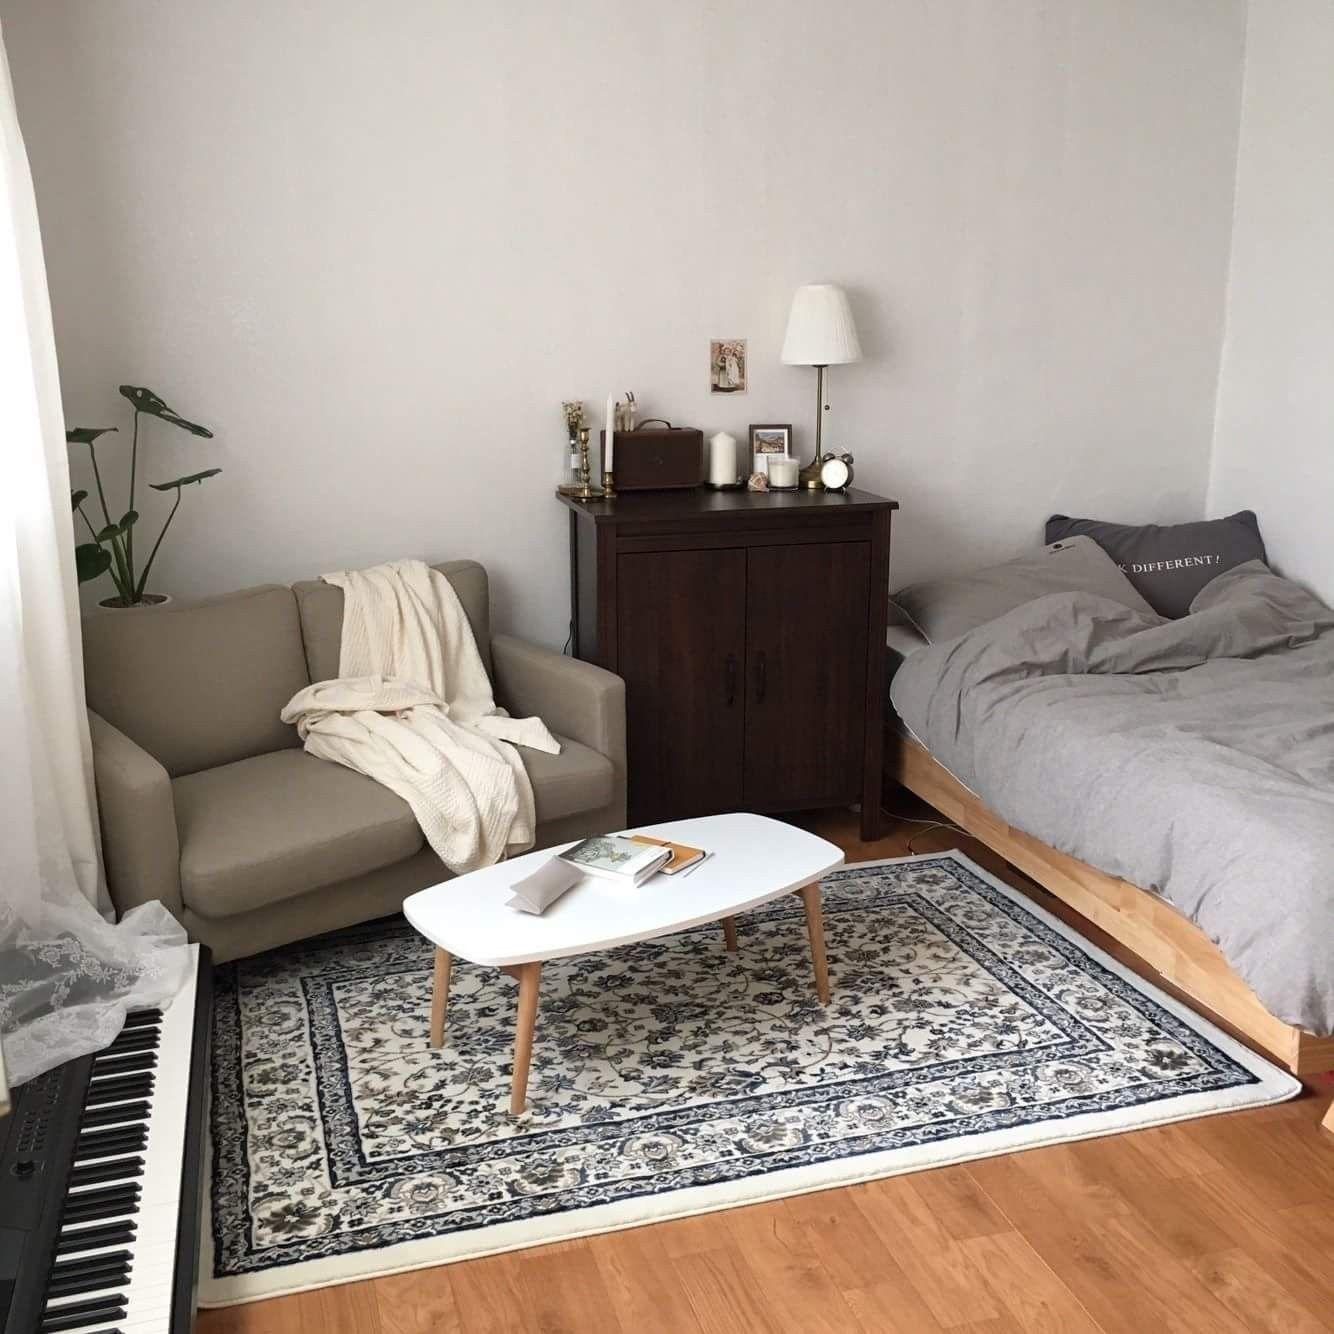 Elegant Bedroom Pics: 37+ An Elegant Studio Apartment Ideas [with Pictures